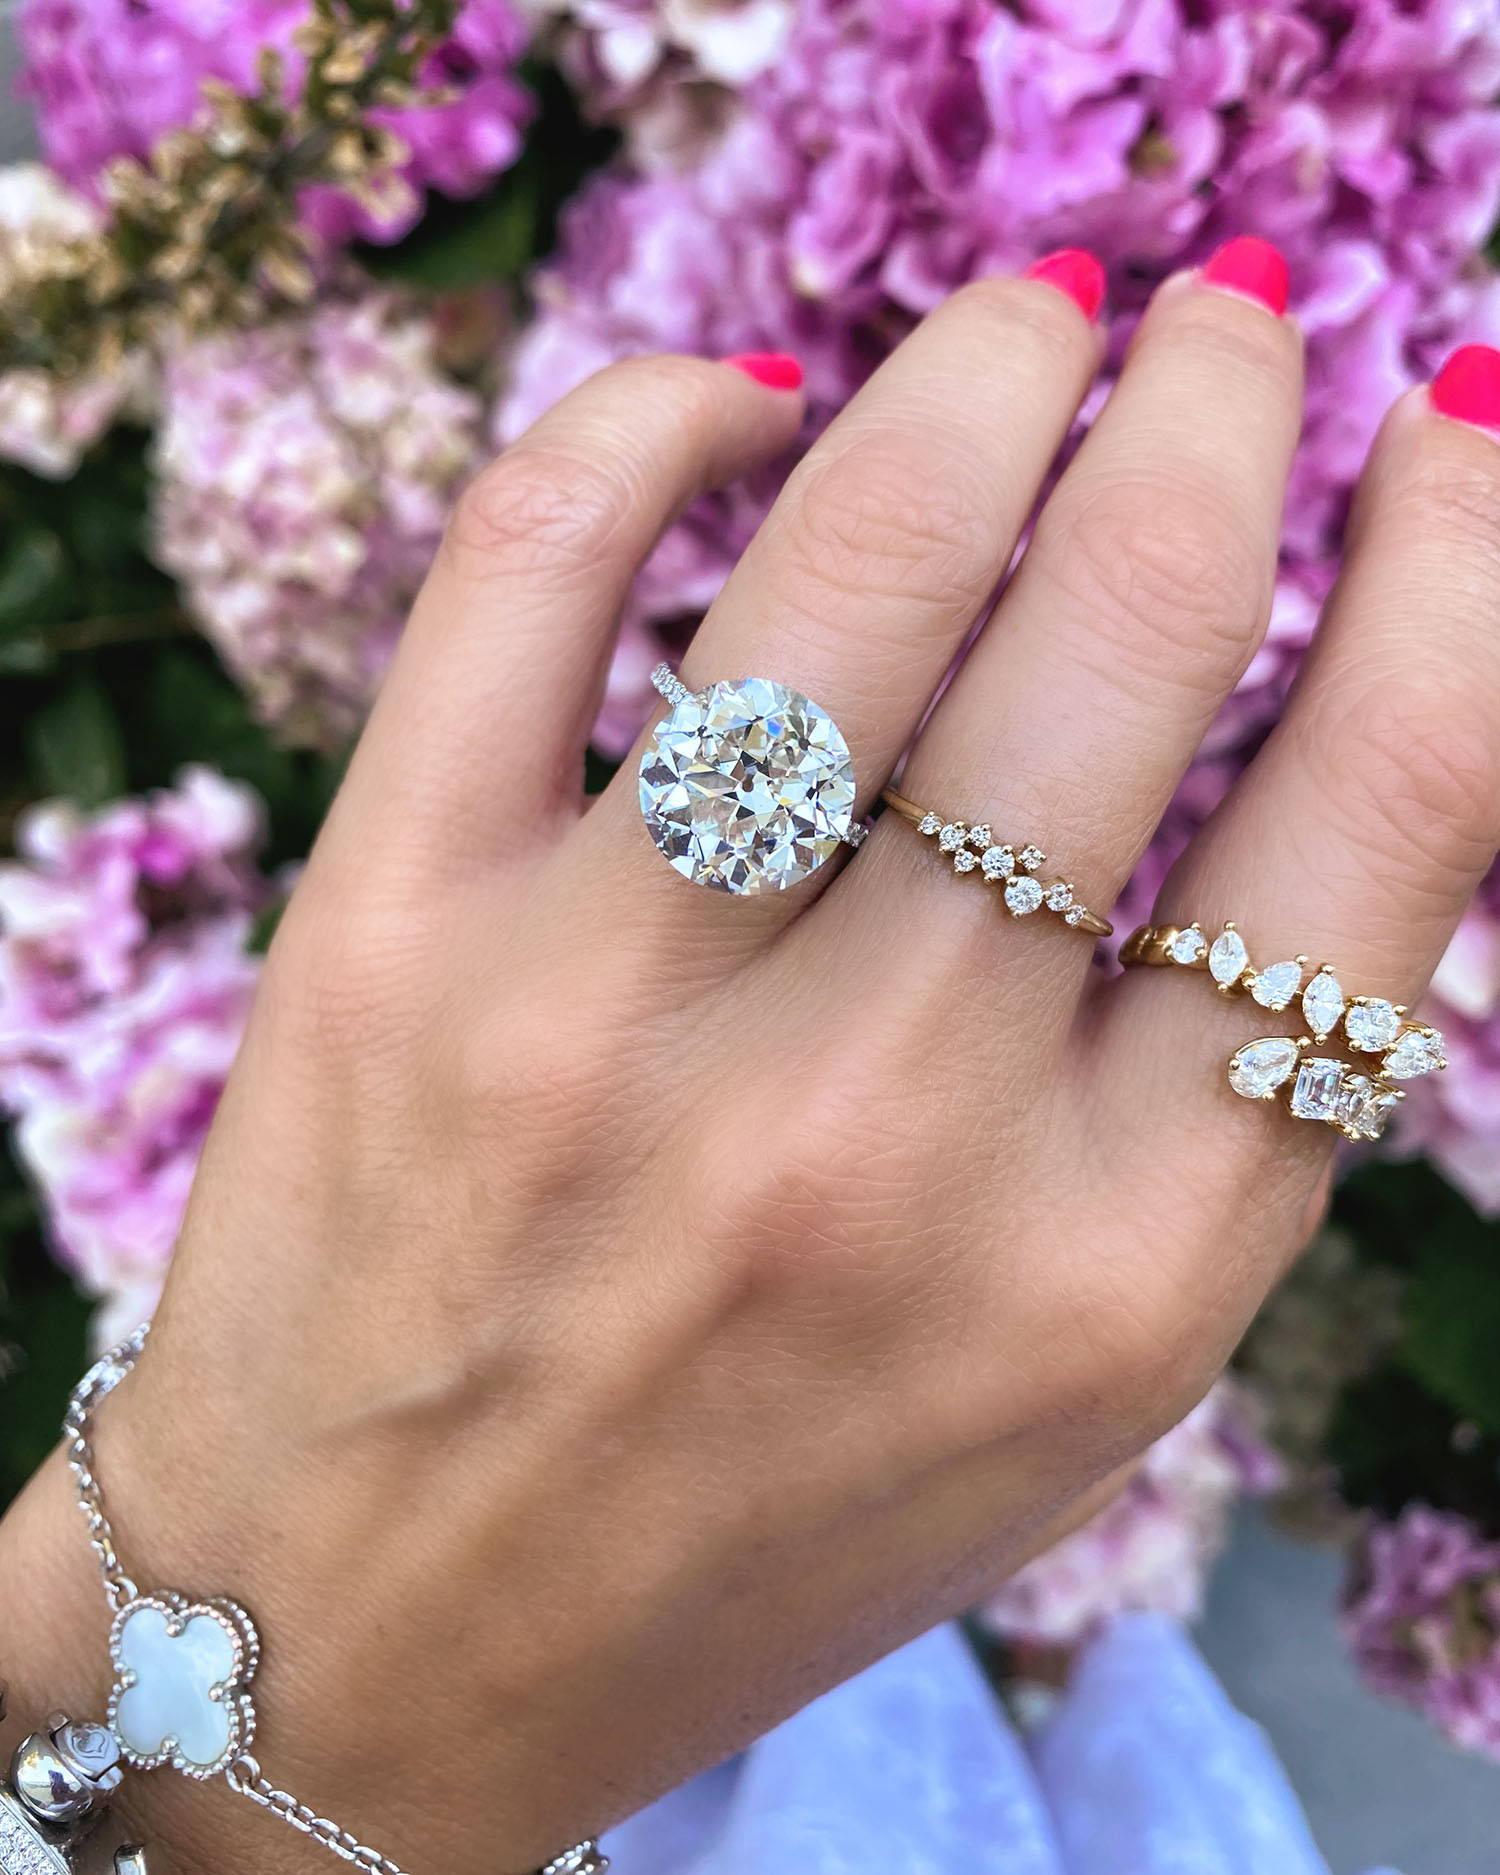 Miss Diamond Ring 7 Carat 8 Carat Round Diamond Engagement Ring